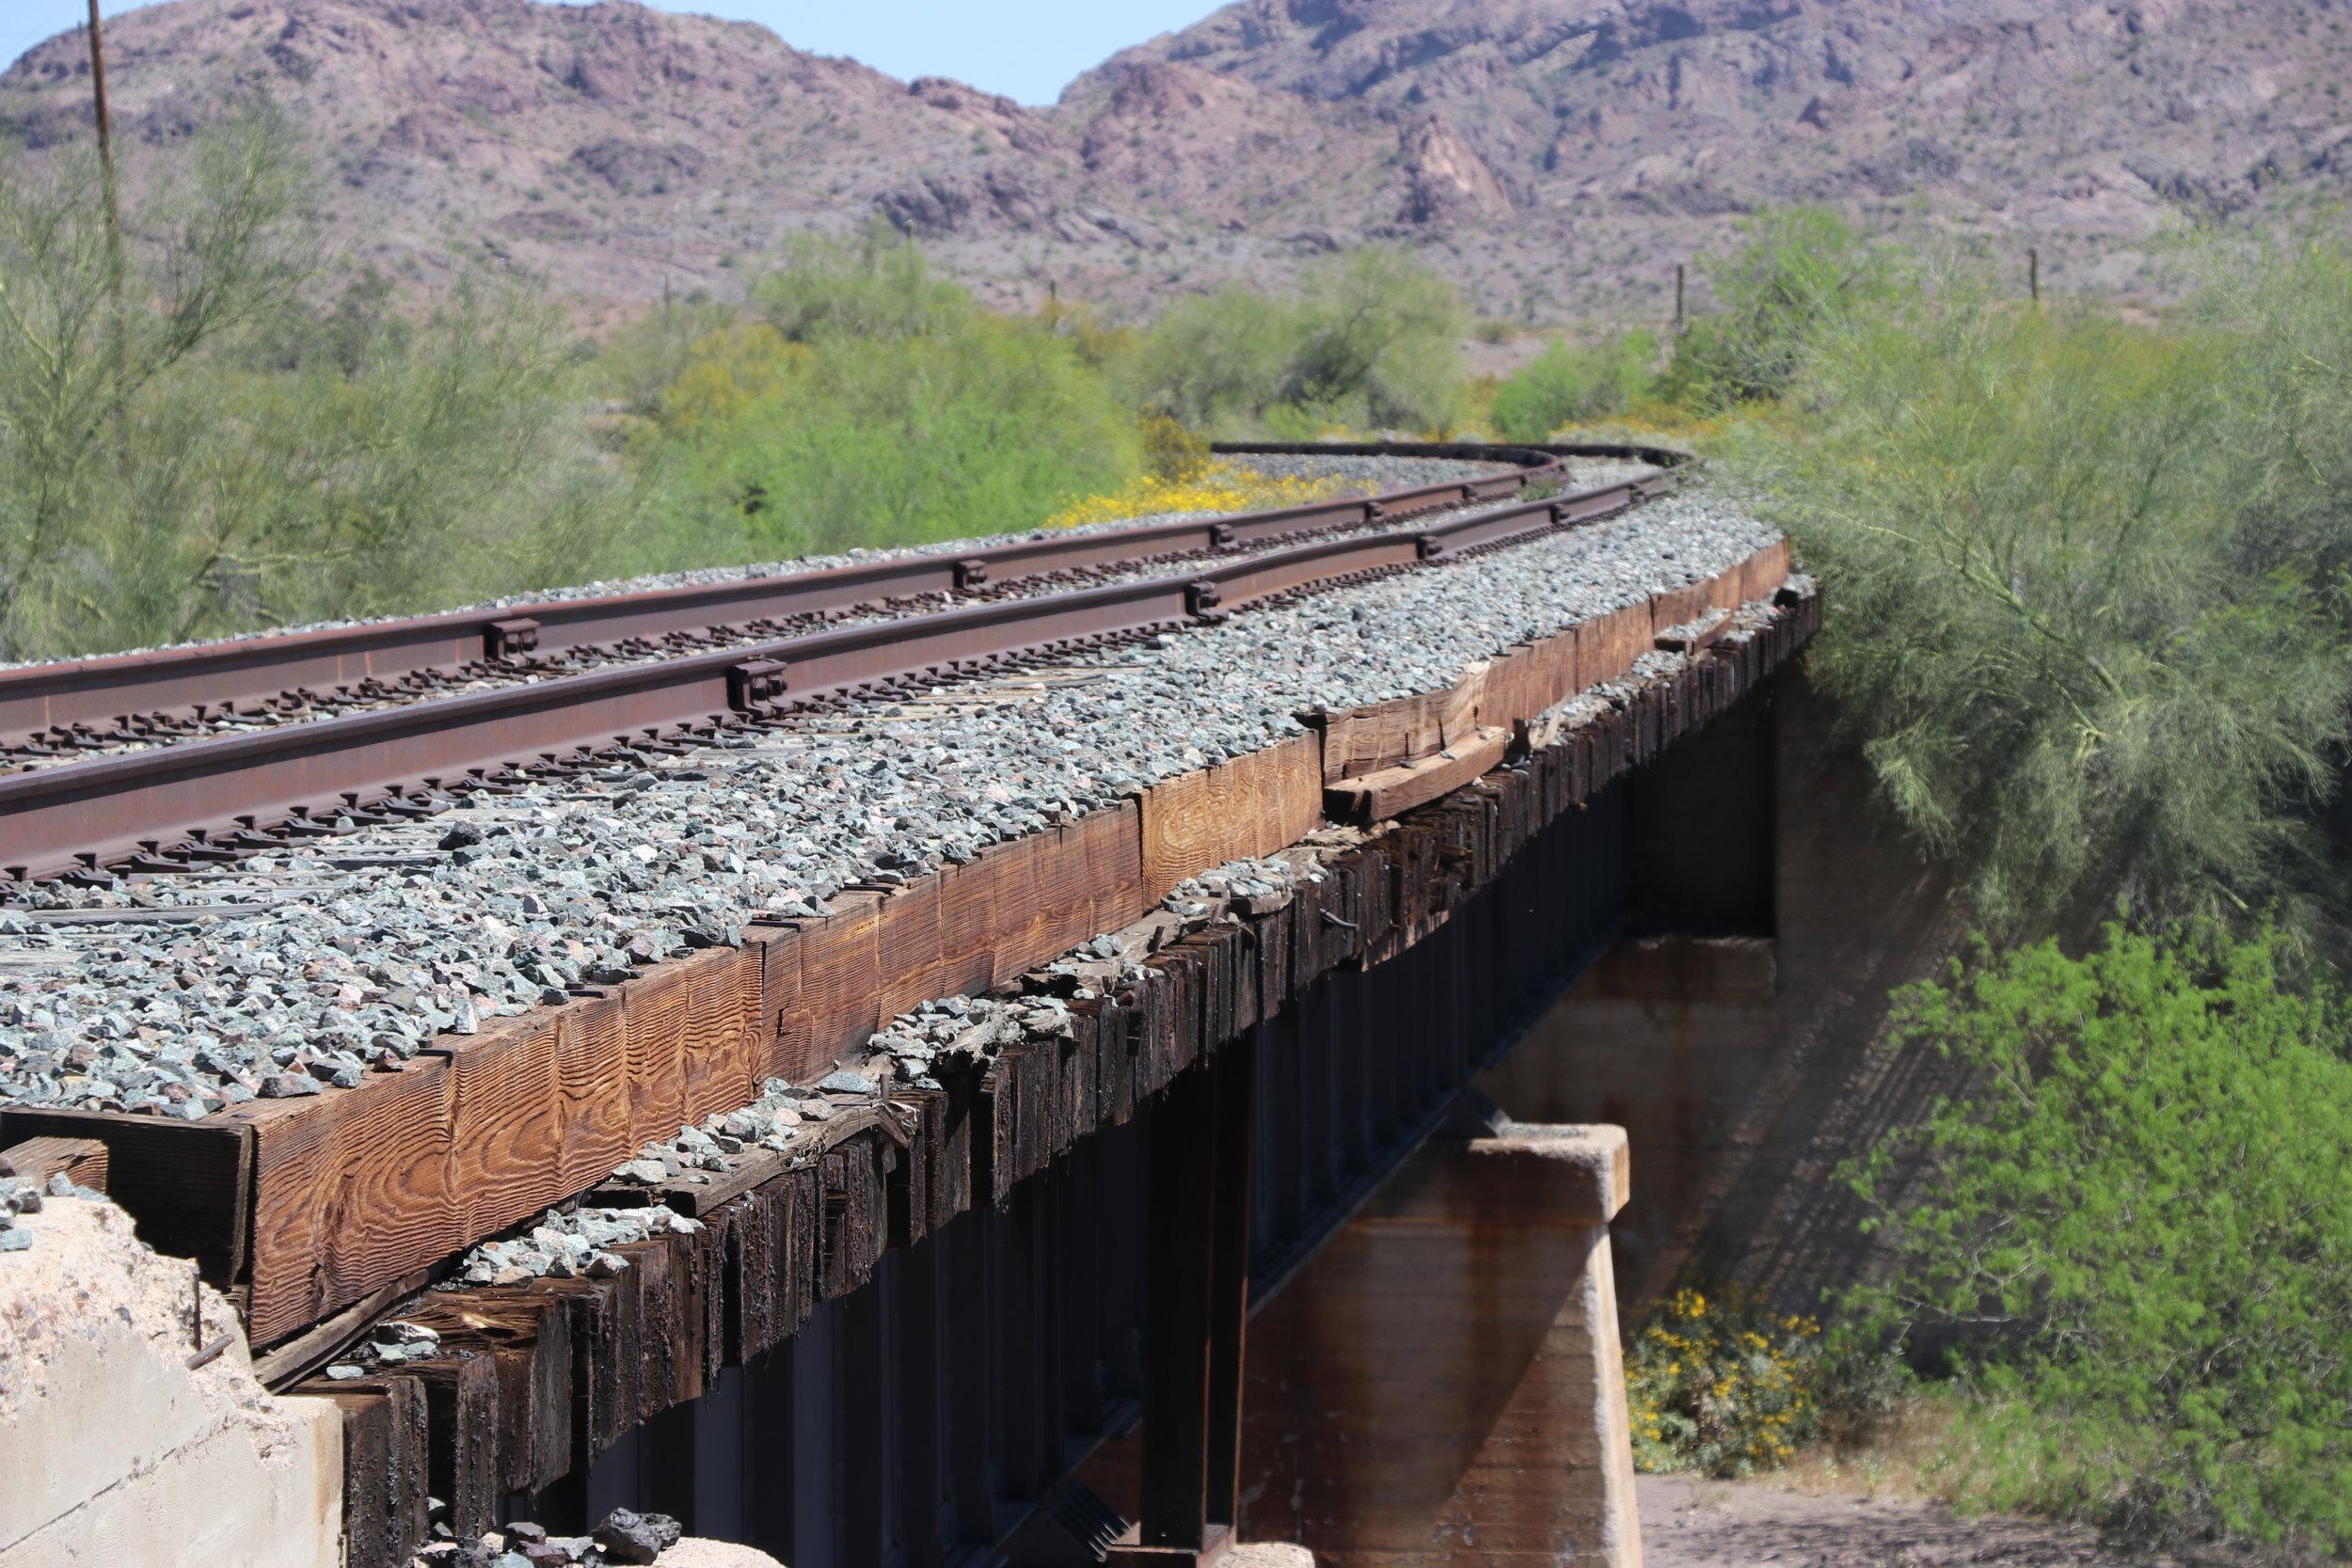 Railroad bridge over Quail Springs Wash.